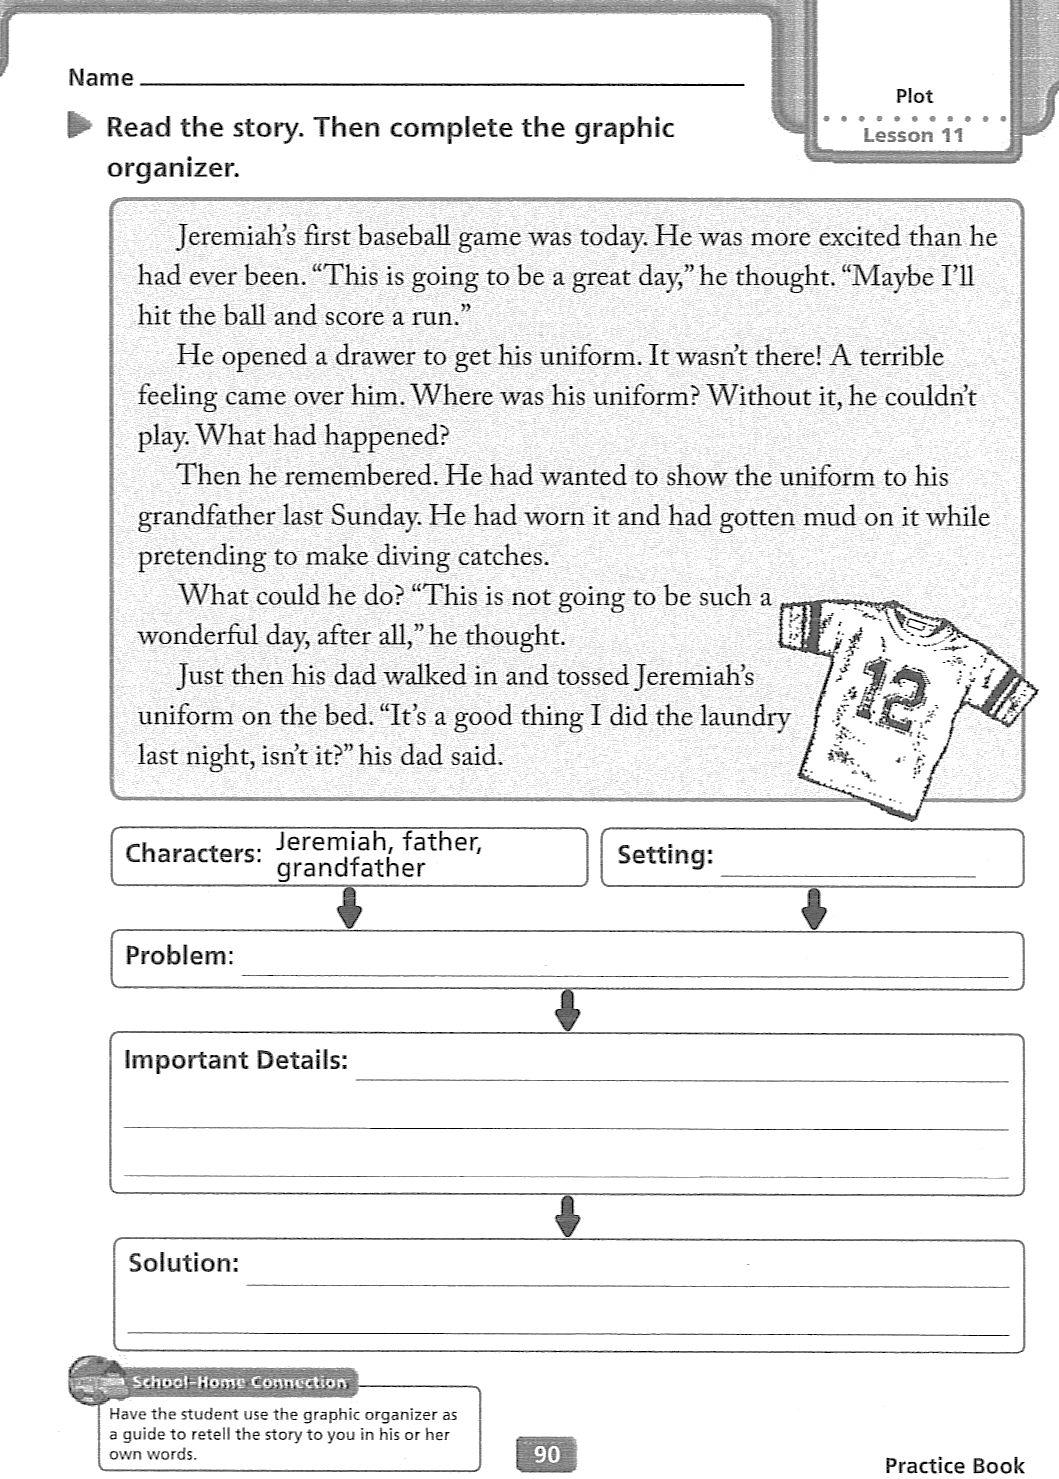 Homework help for grade 11